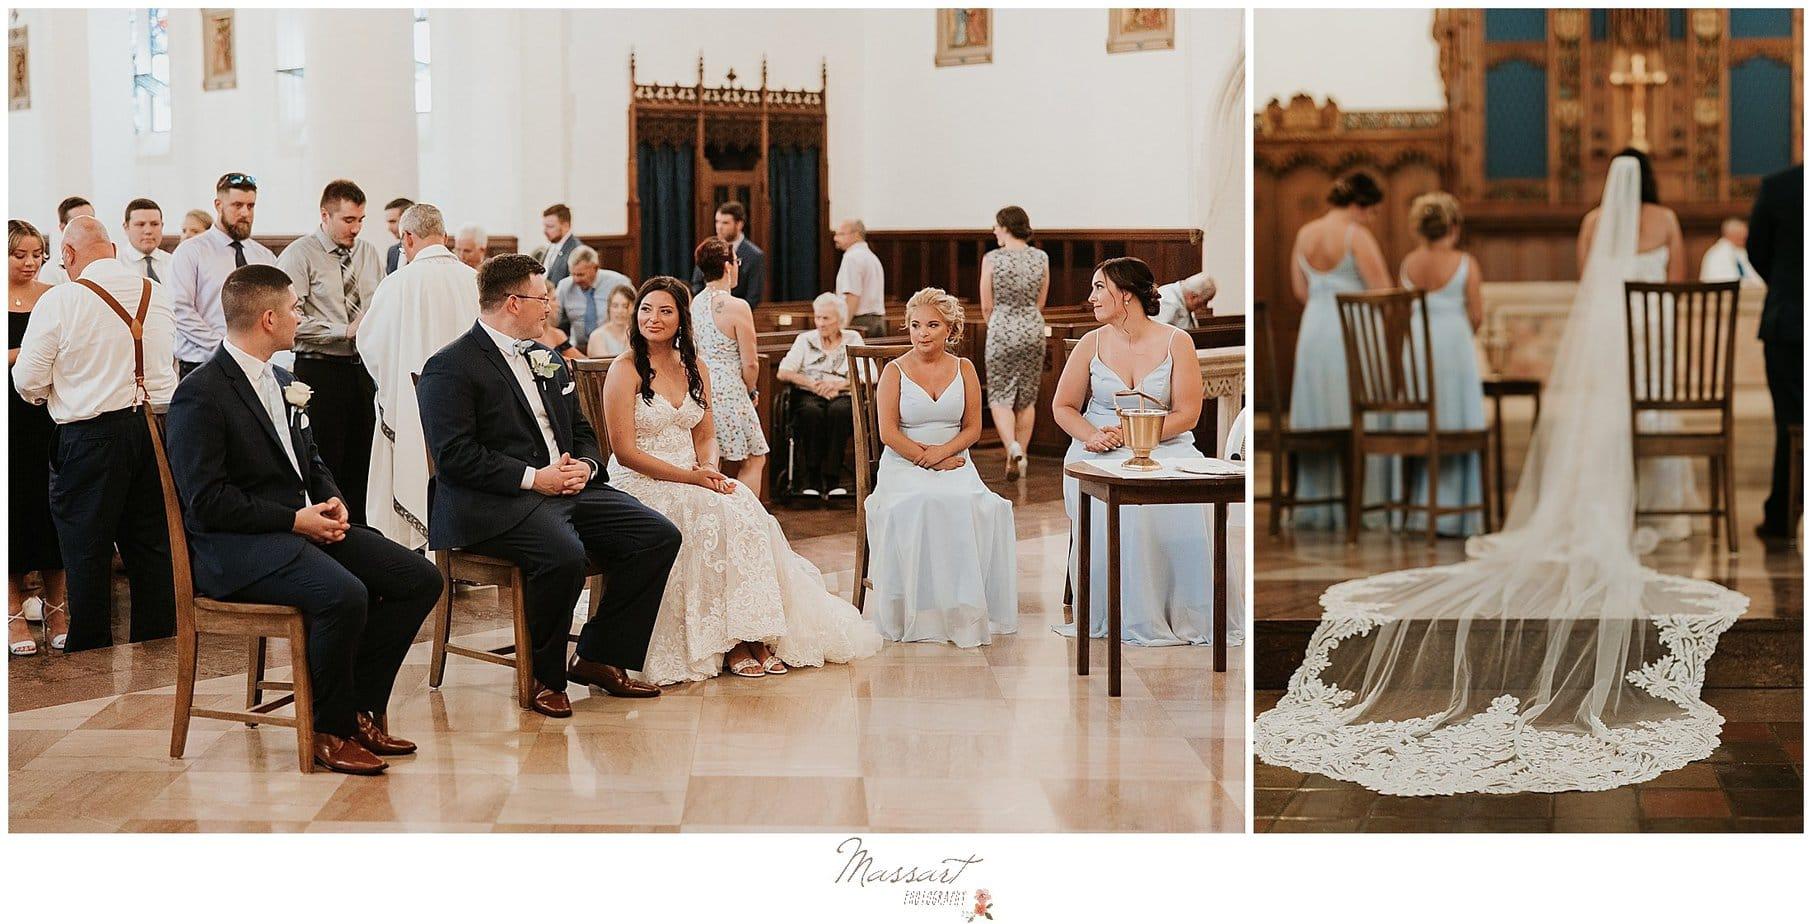 Wedding ceremony in RI by Massart Photography